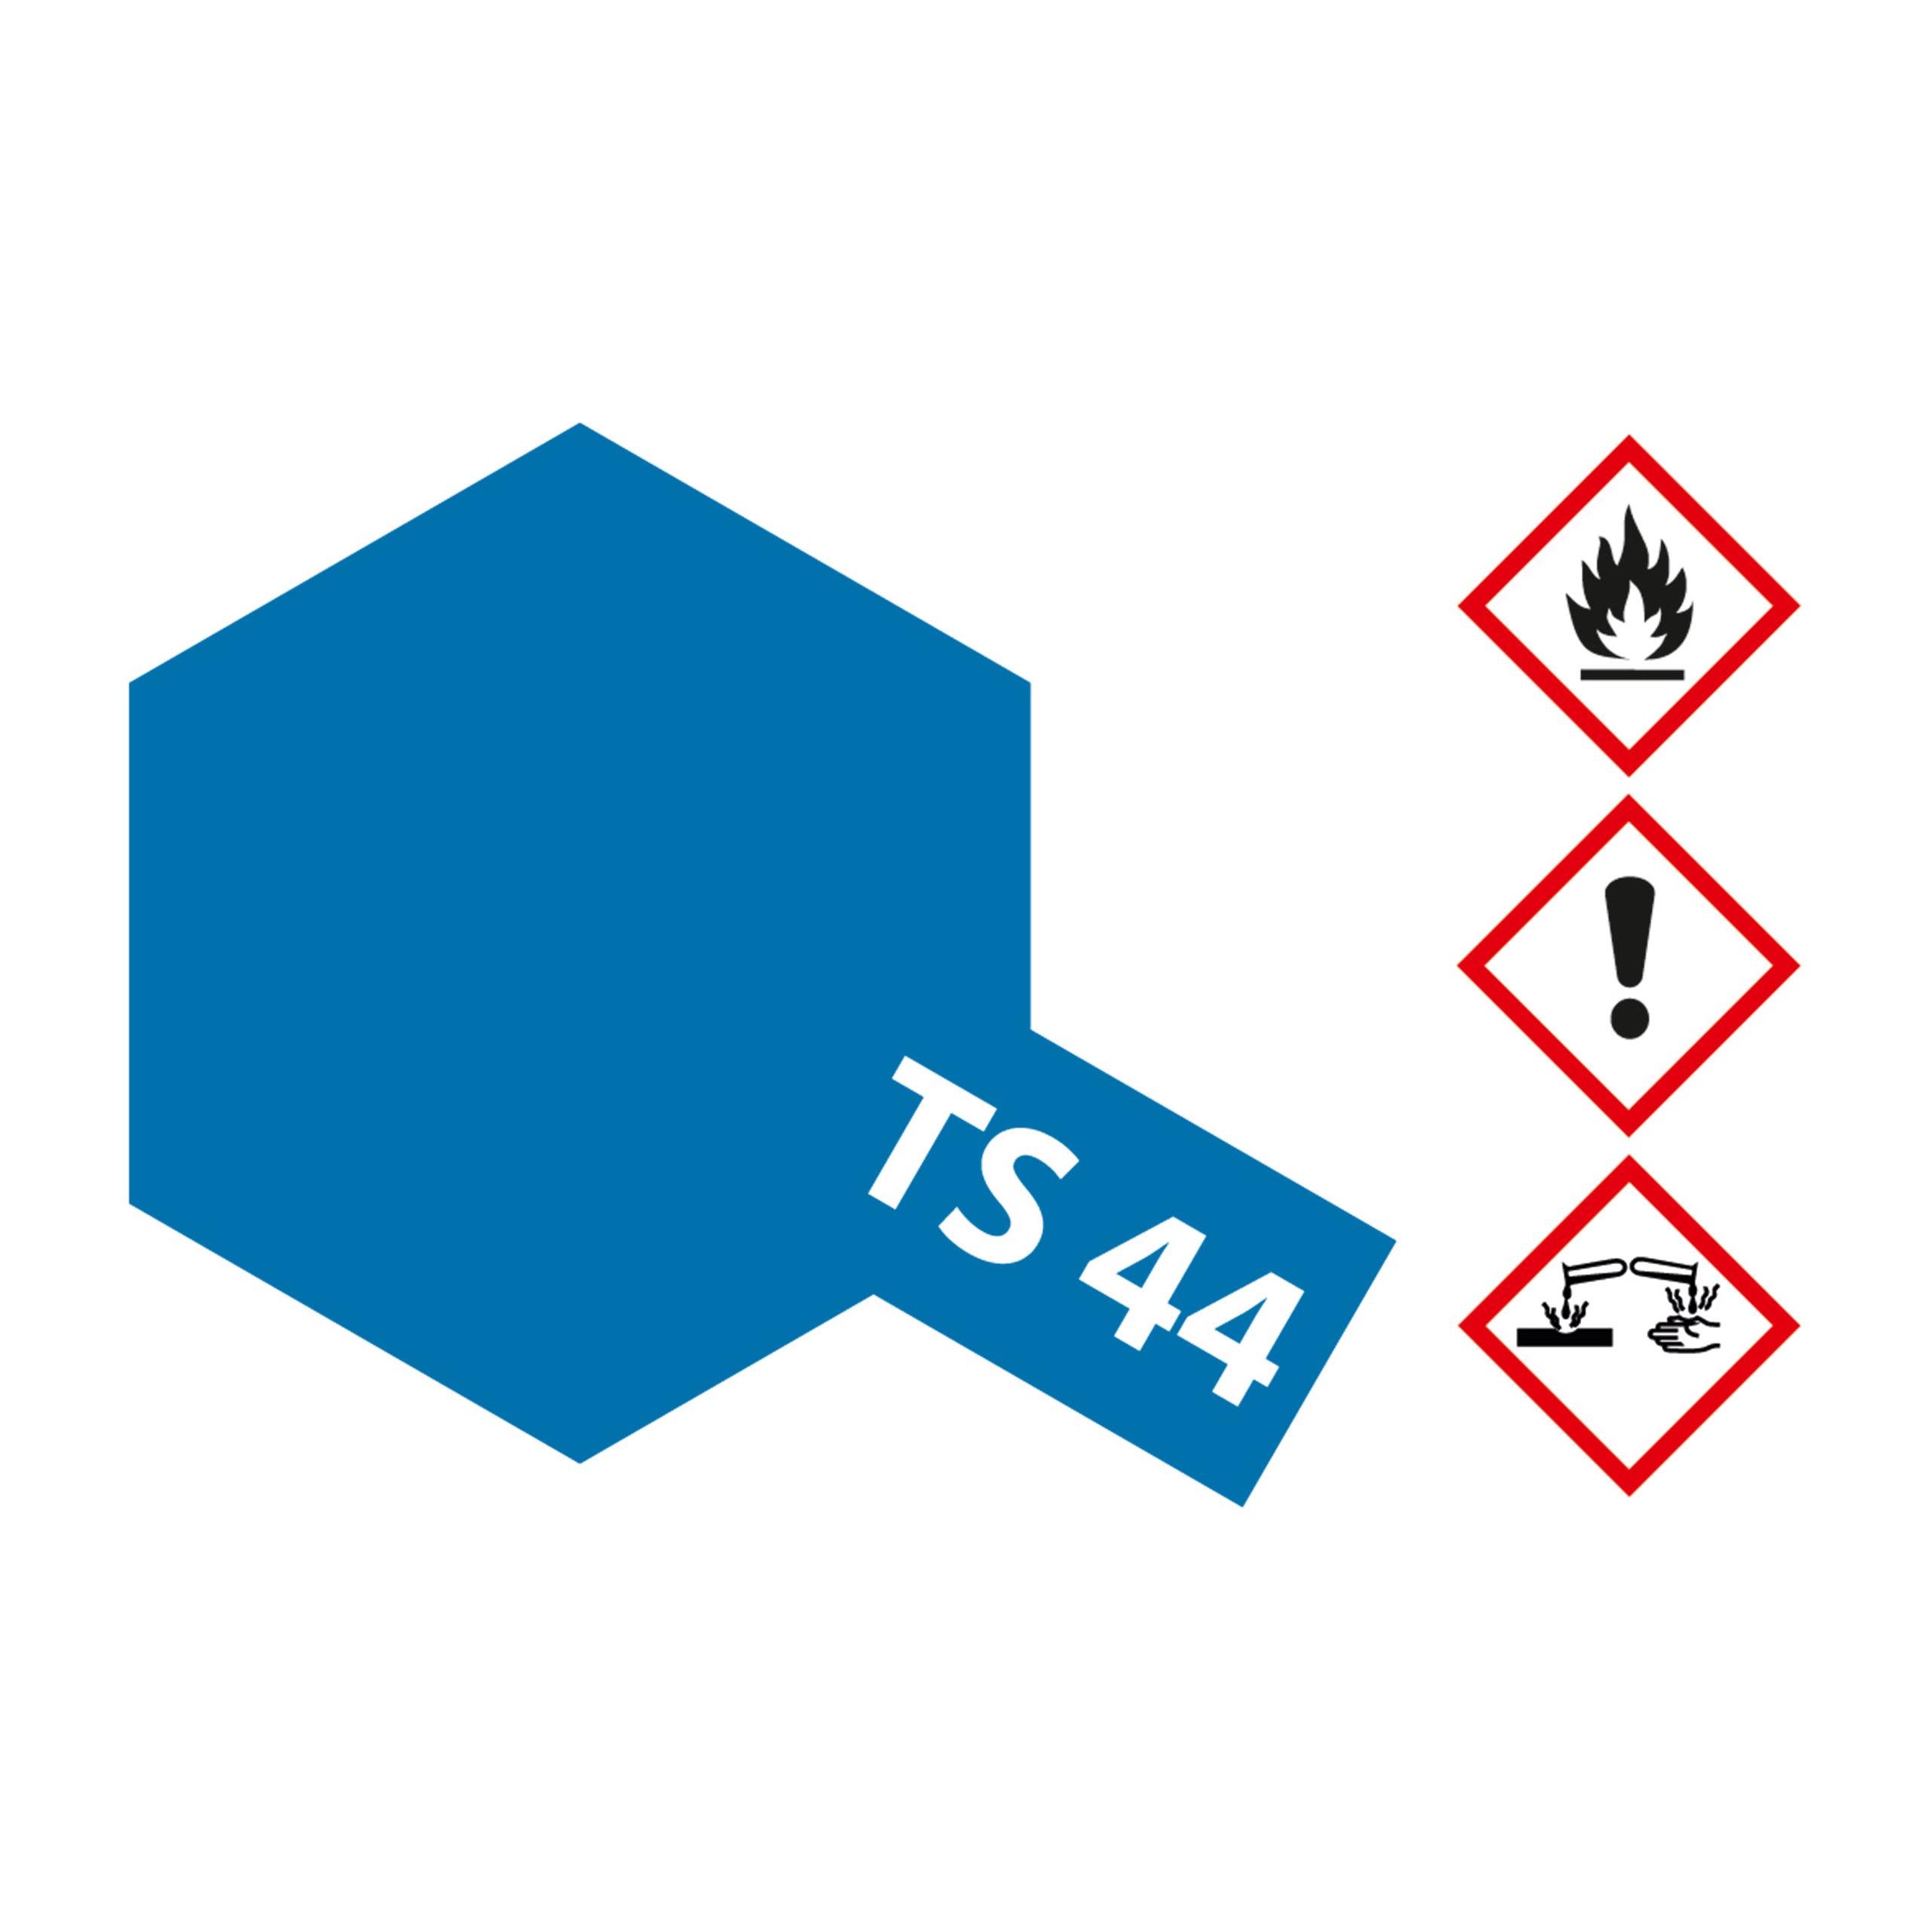 TS-44 Brillant Blau glaenzend - 100ml Sprayfarbe Kunstharz Tamiya 300085044